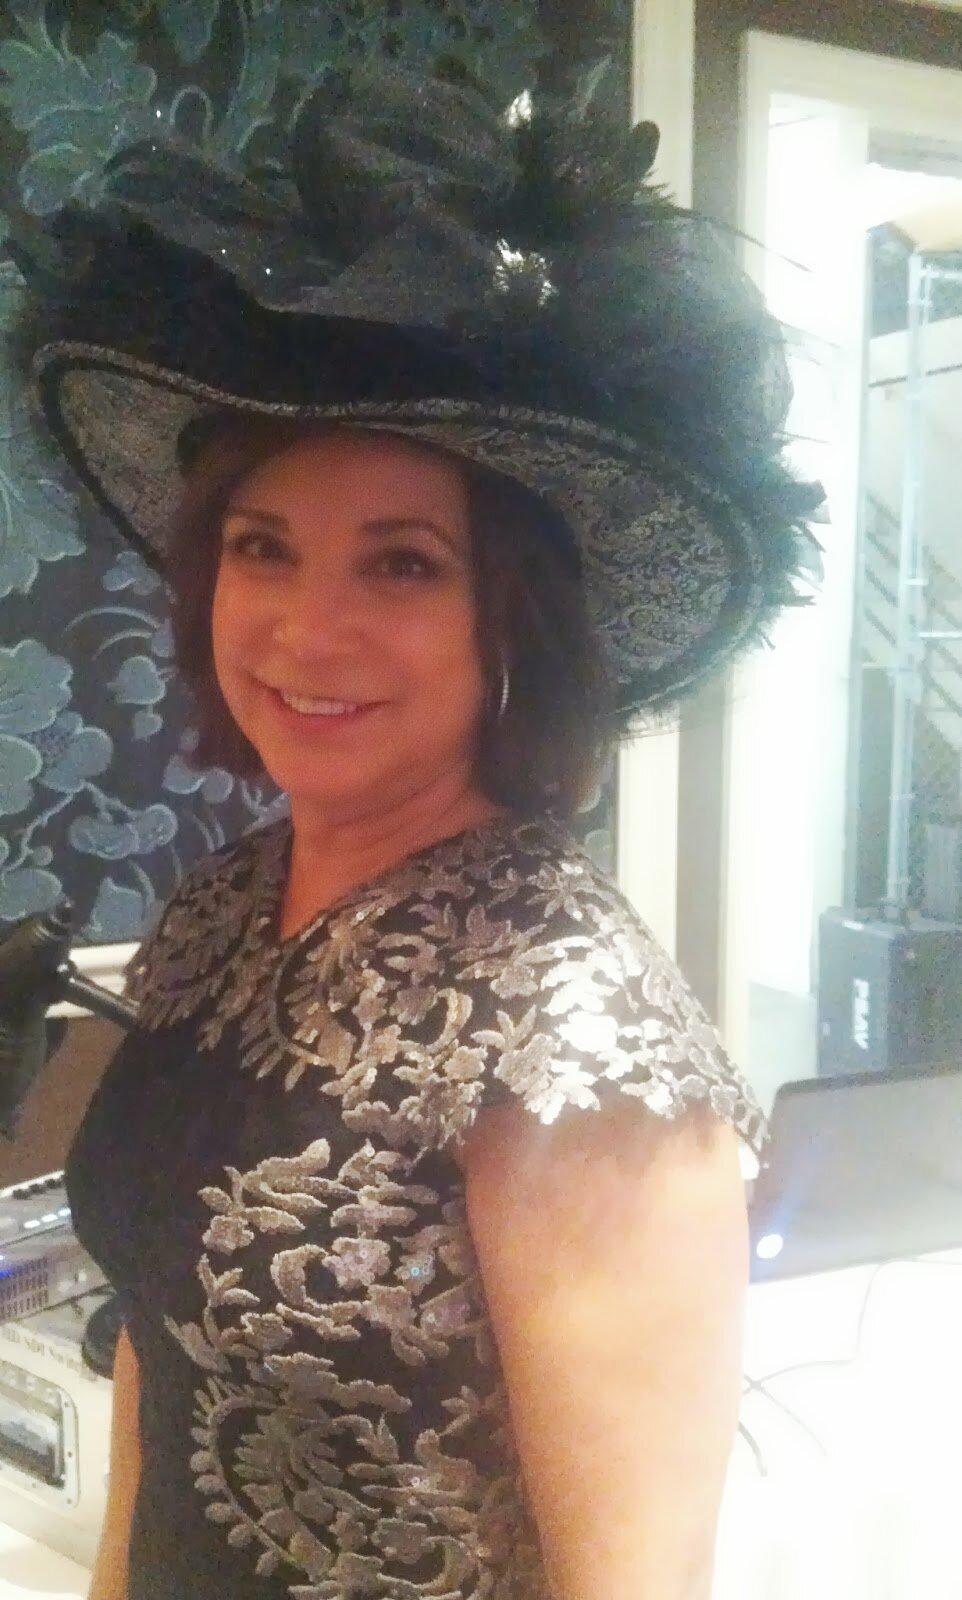 Cheryl Bailey, Founder of Wonderful Witchy Women